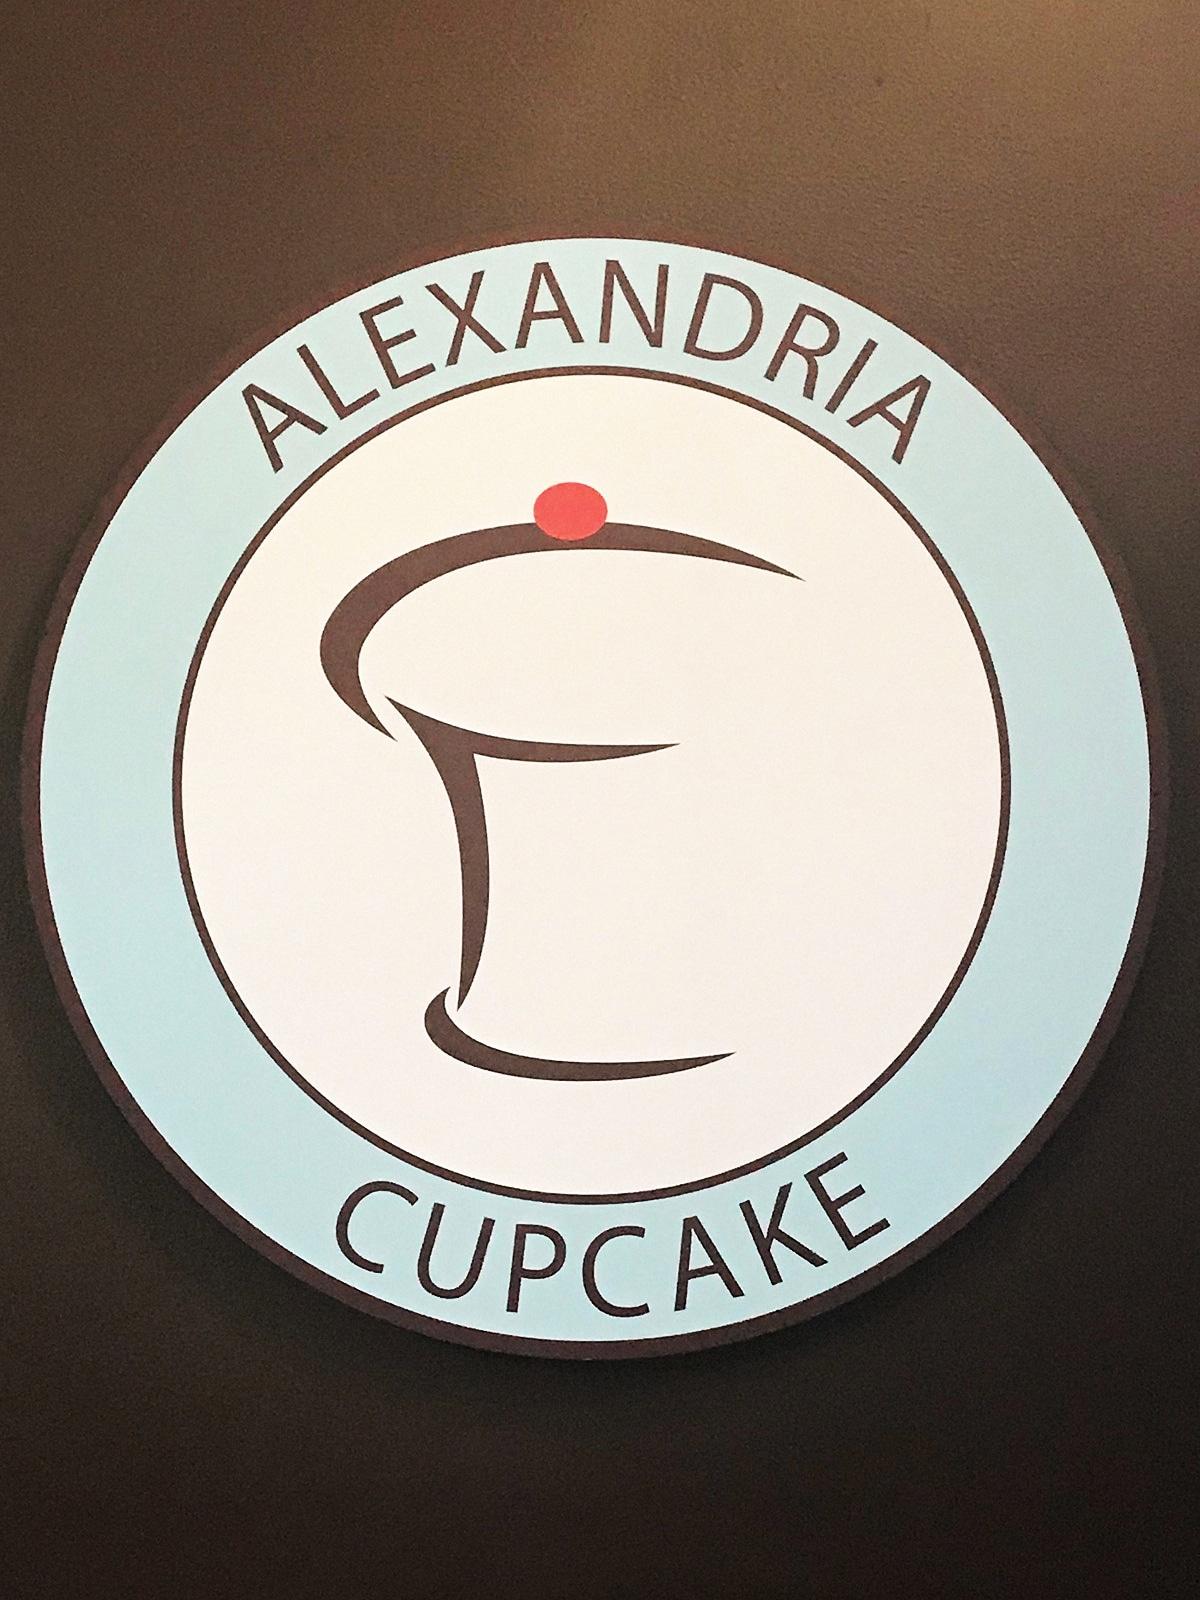 Date Night - Alexandria CupCakes